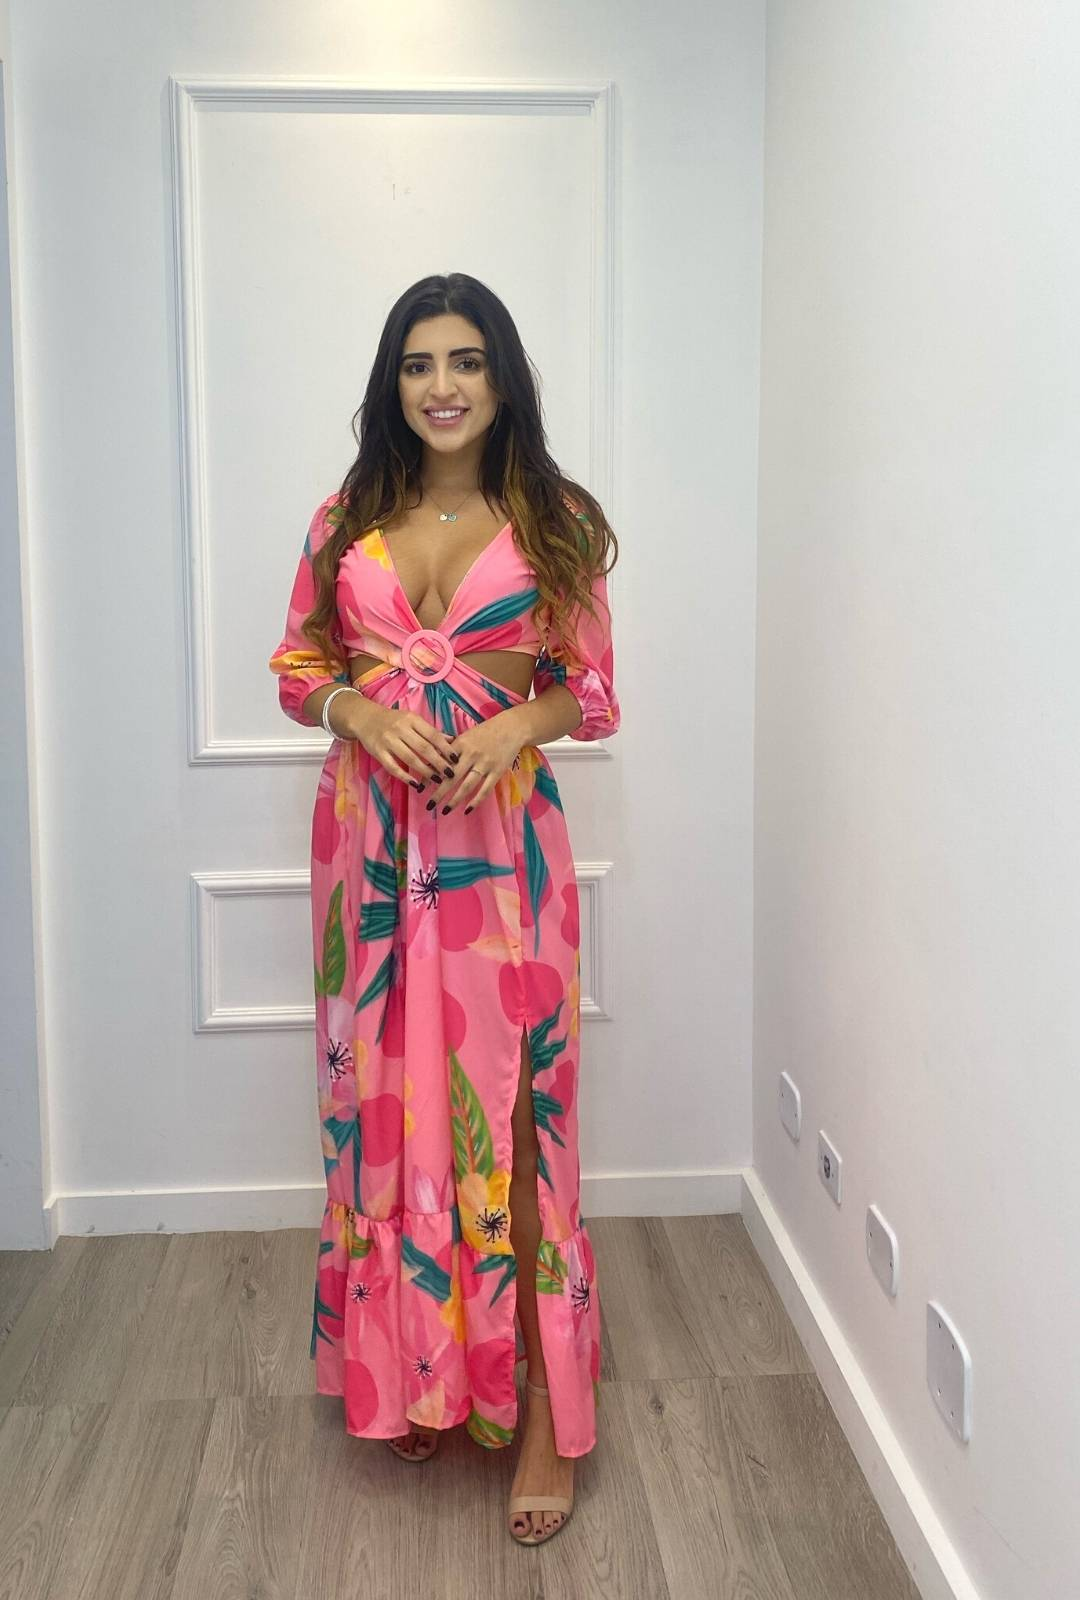 Vestido Thamirys Longo Floral Crepe Abertura Argola Rosa